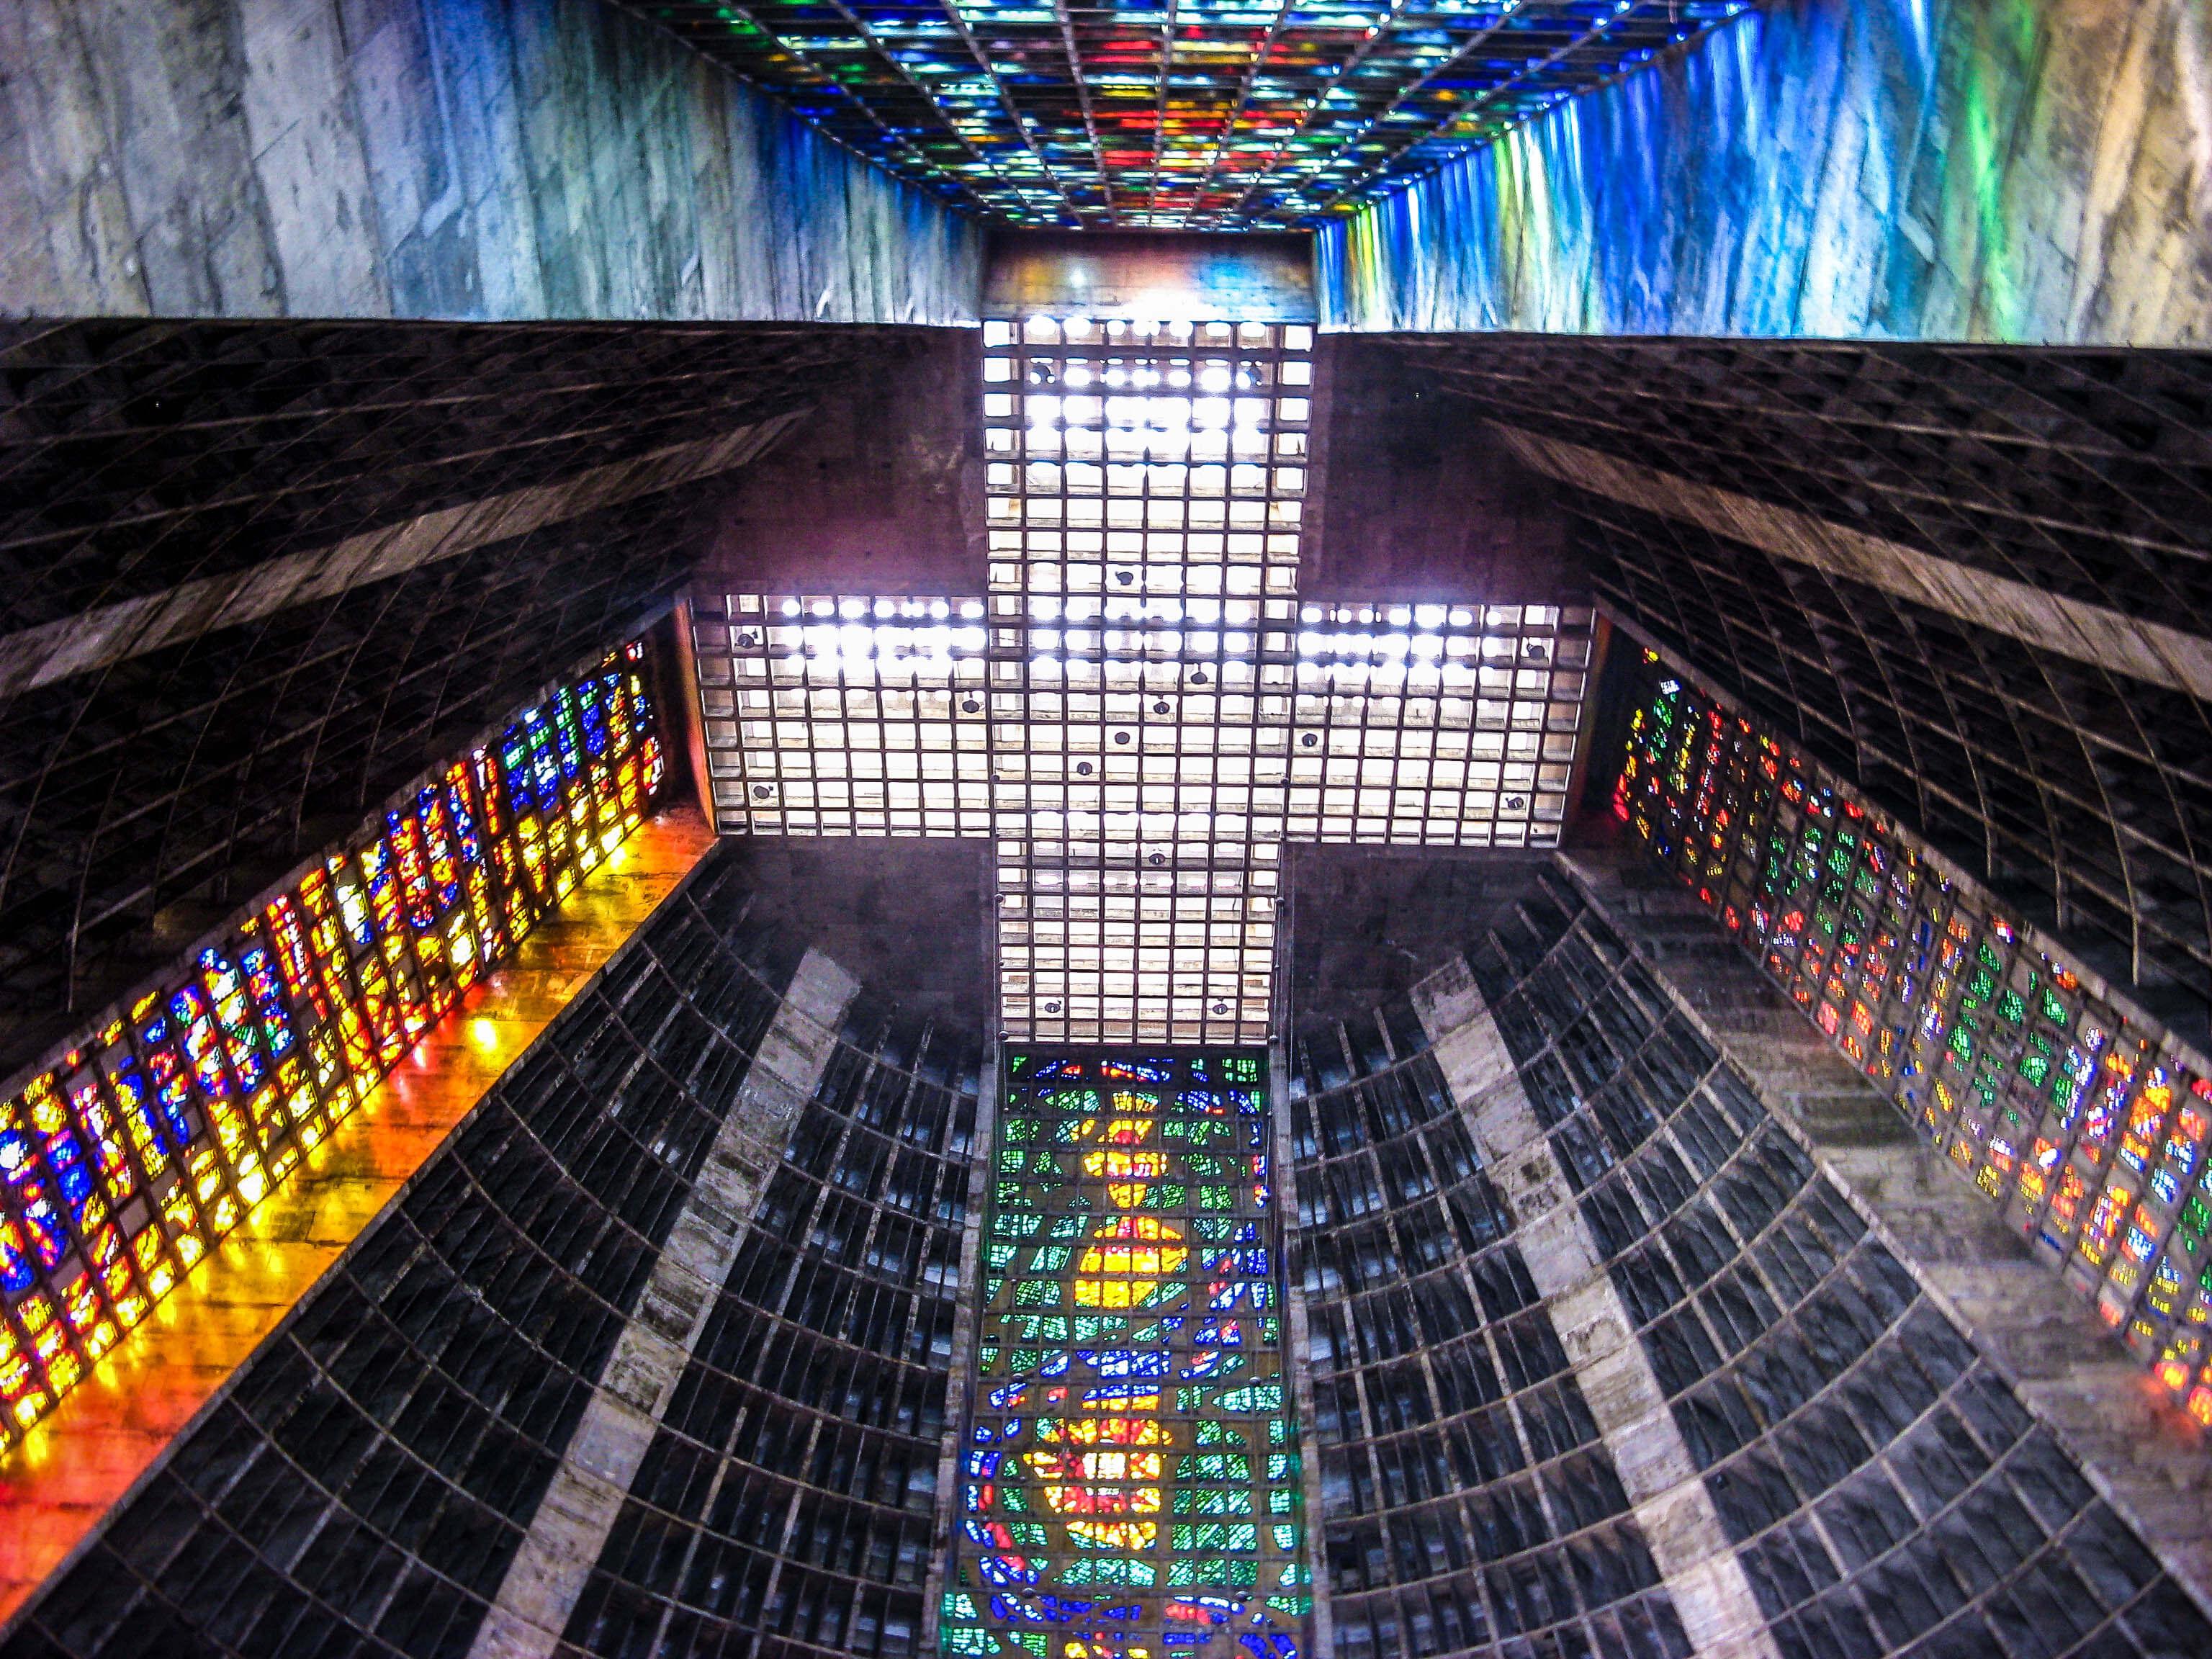 Die Catedral Metropolitana in Rio de Janeiro ist faszinierend